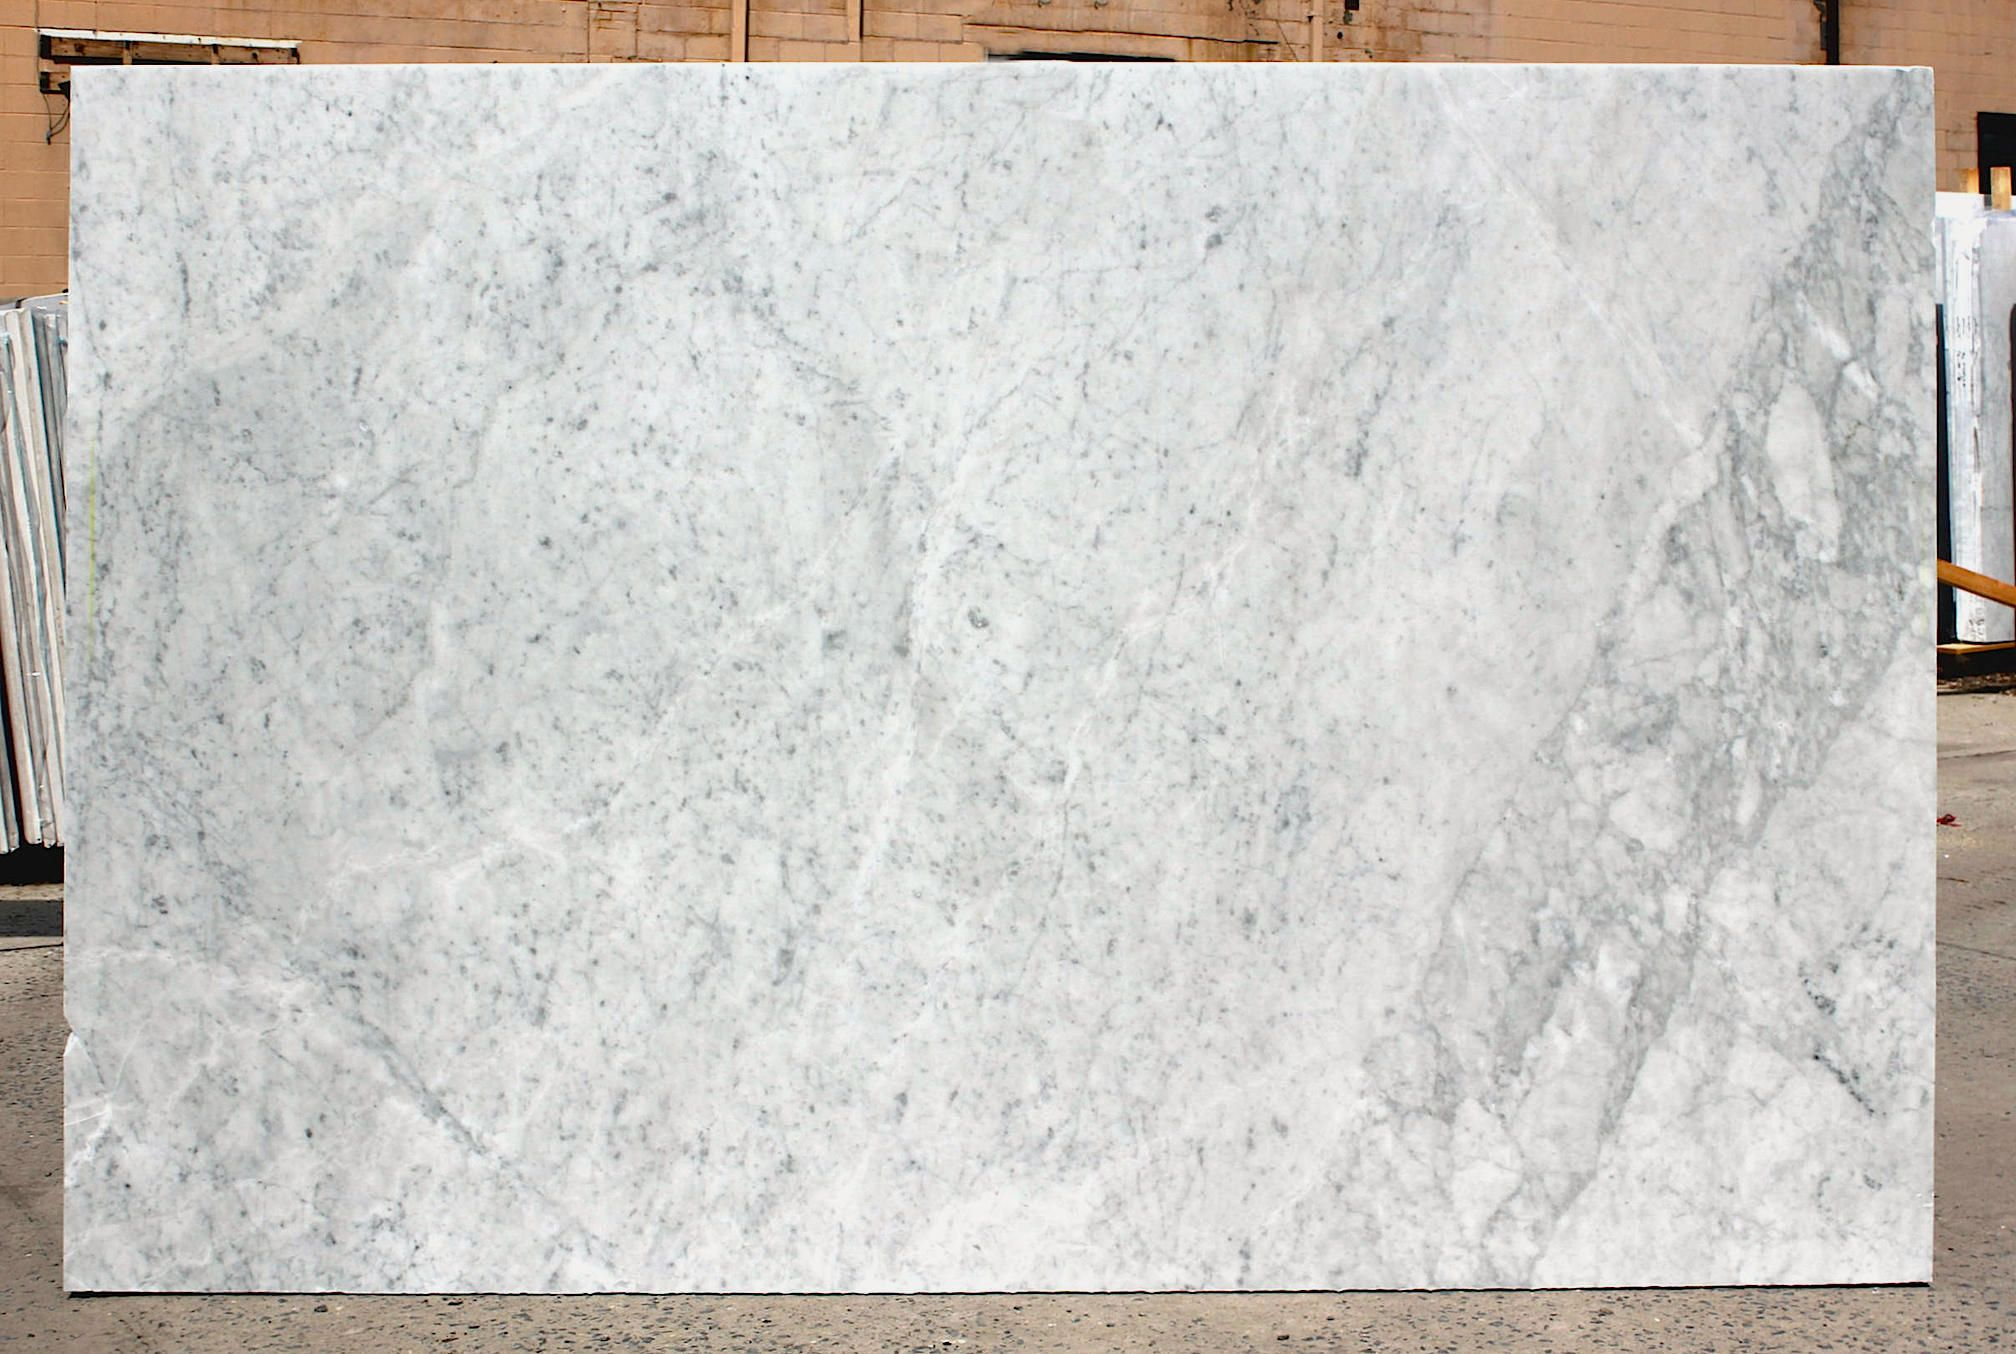 Leather Finish White Stone Countertops Carrara Honed European Granite Marble Group